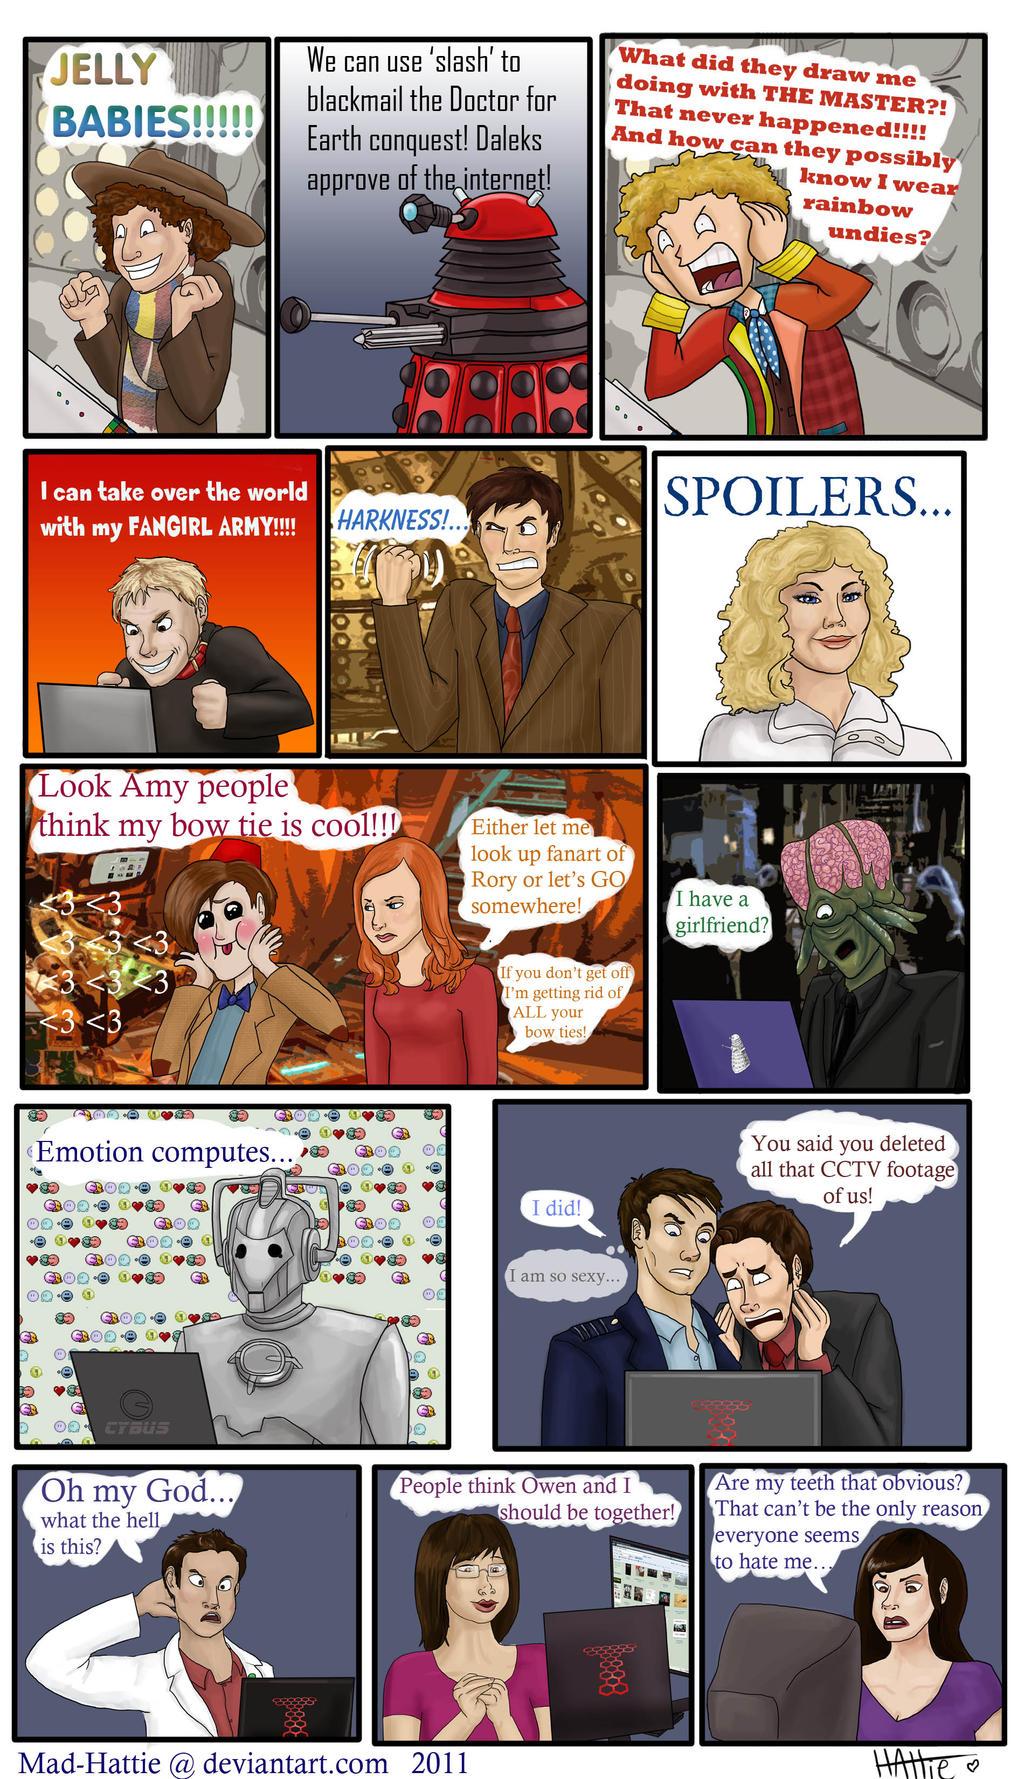 Doctor Who Finds deviantART by Mad-Hattie